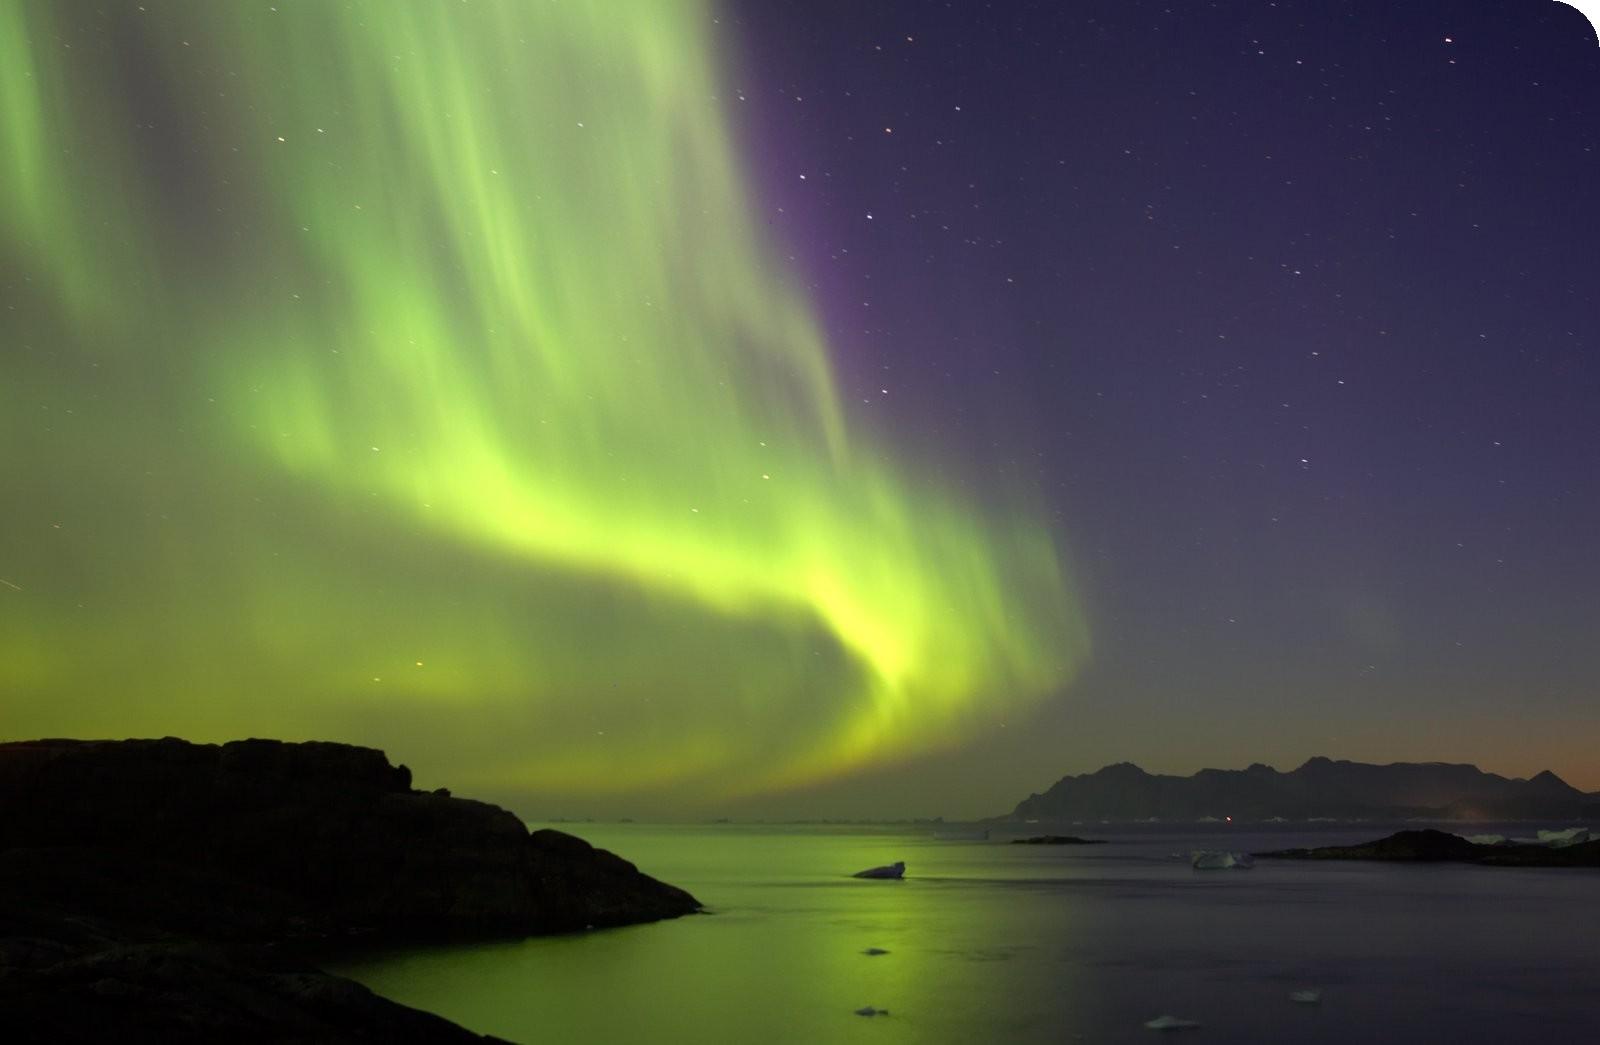 Aurora Borealis Bakgrund and Bakgrund | 1600x1045 | ID:8786 - Wallpaper Abyss